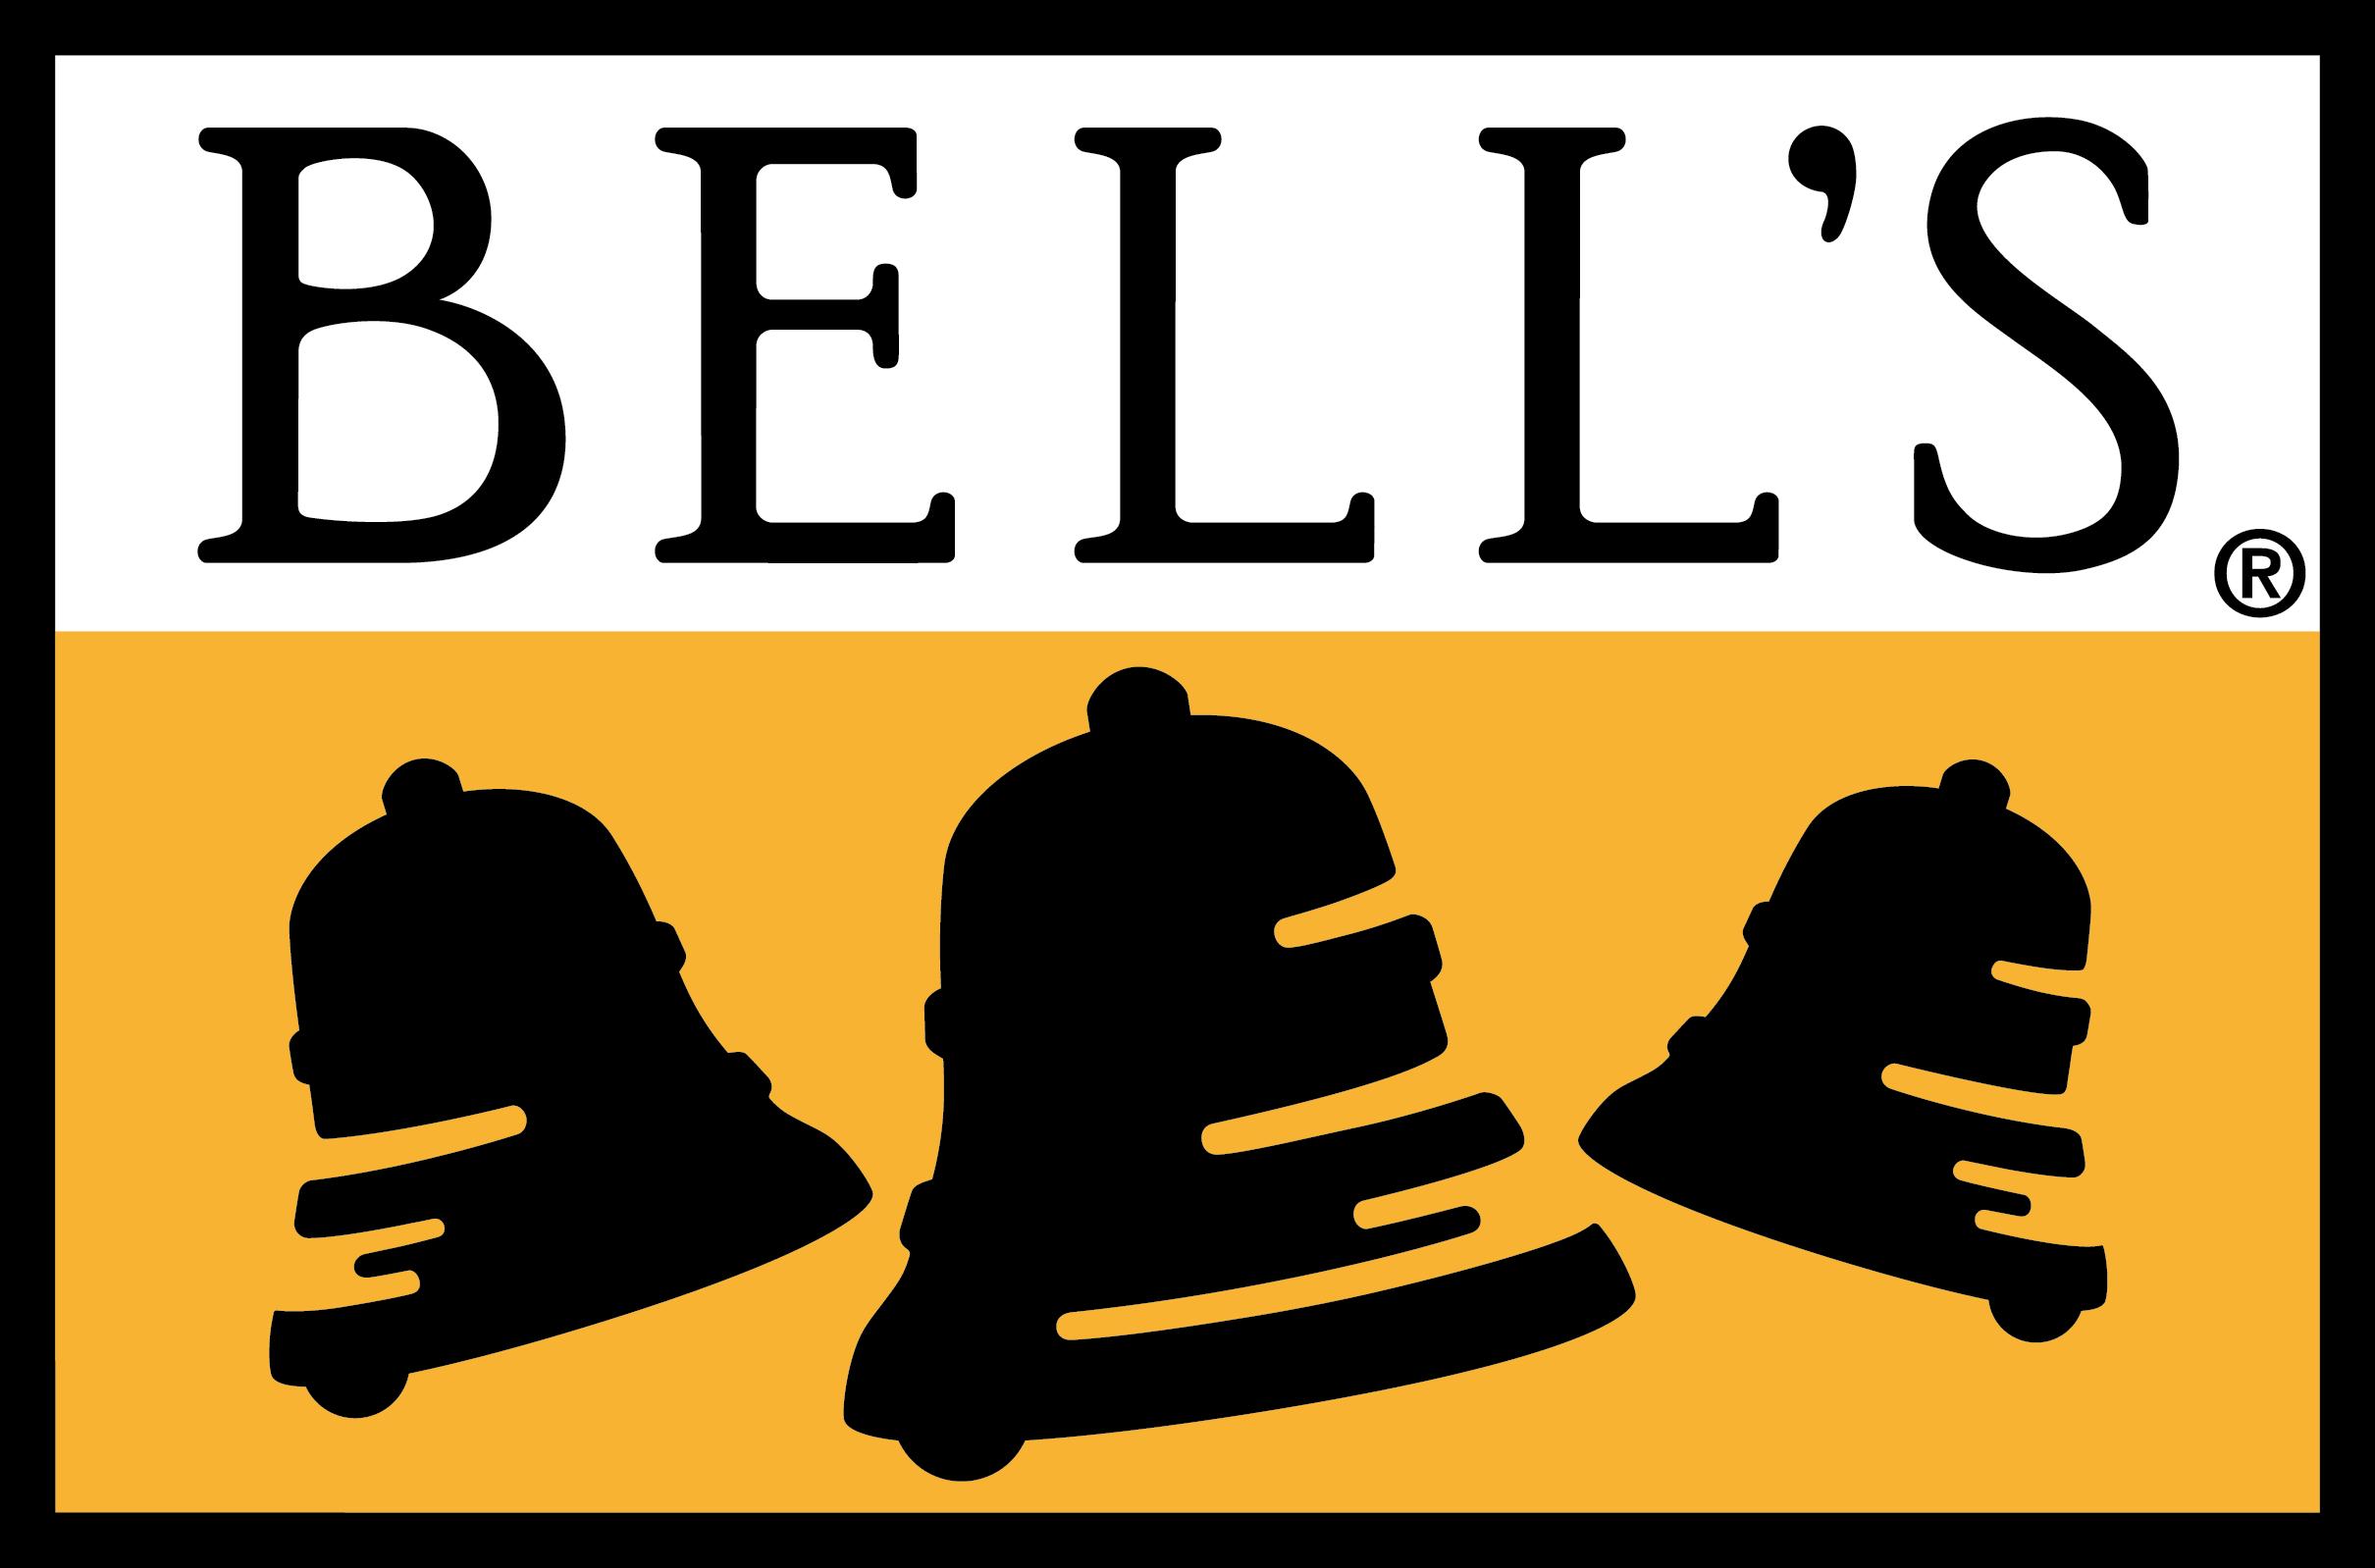 Bells_NEW_LOGO_Main_NO_TAG.png